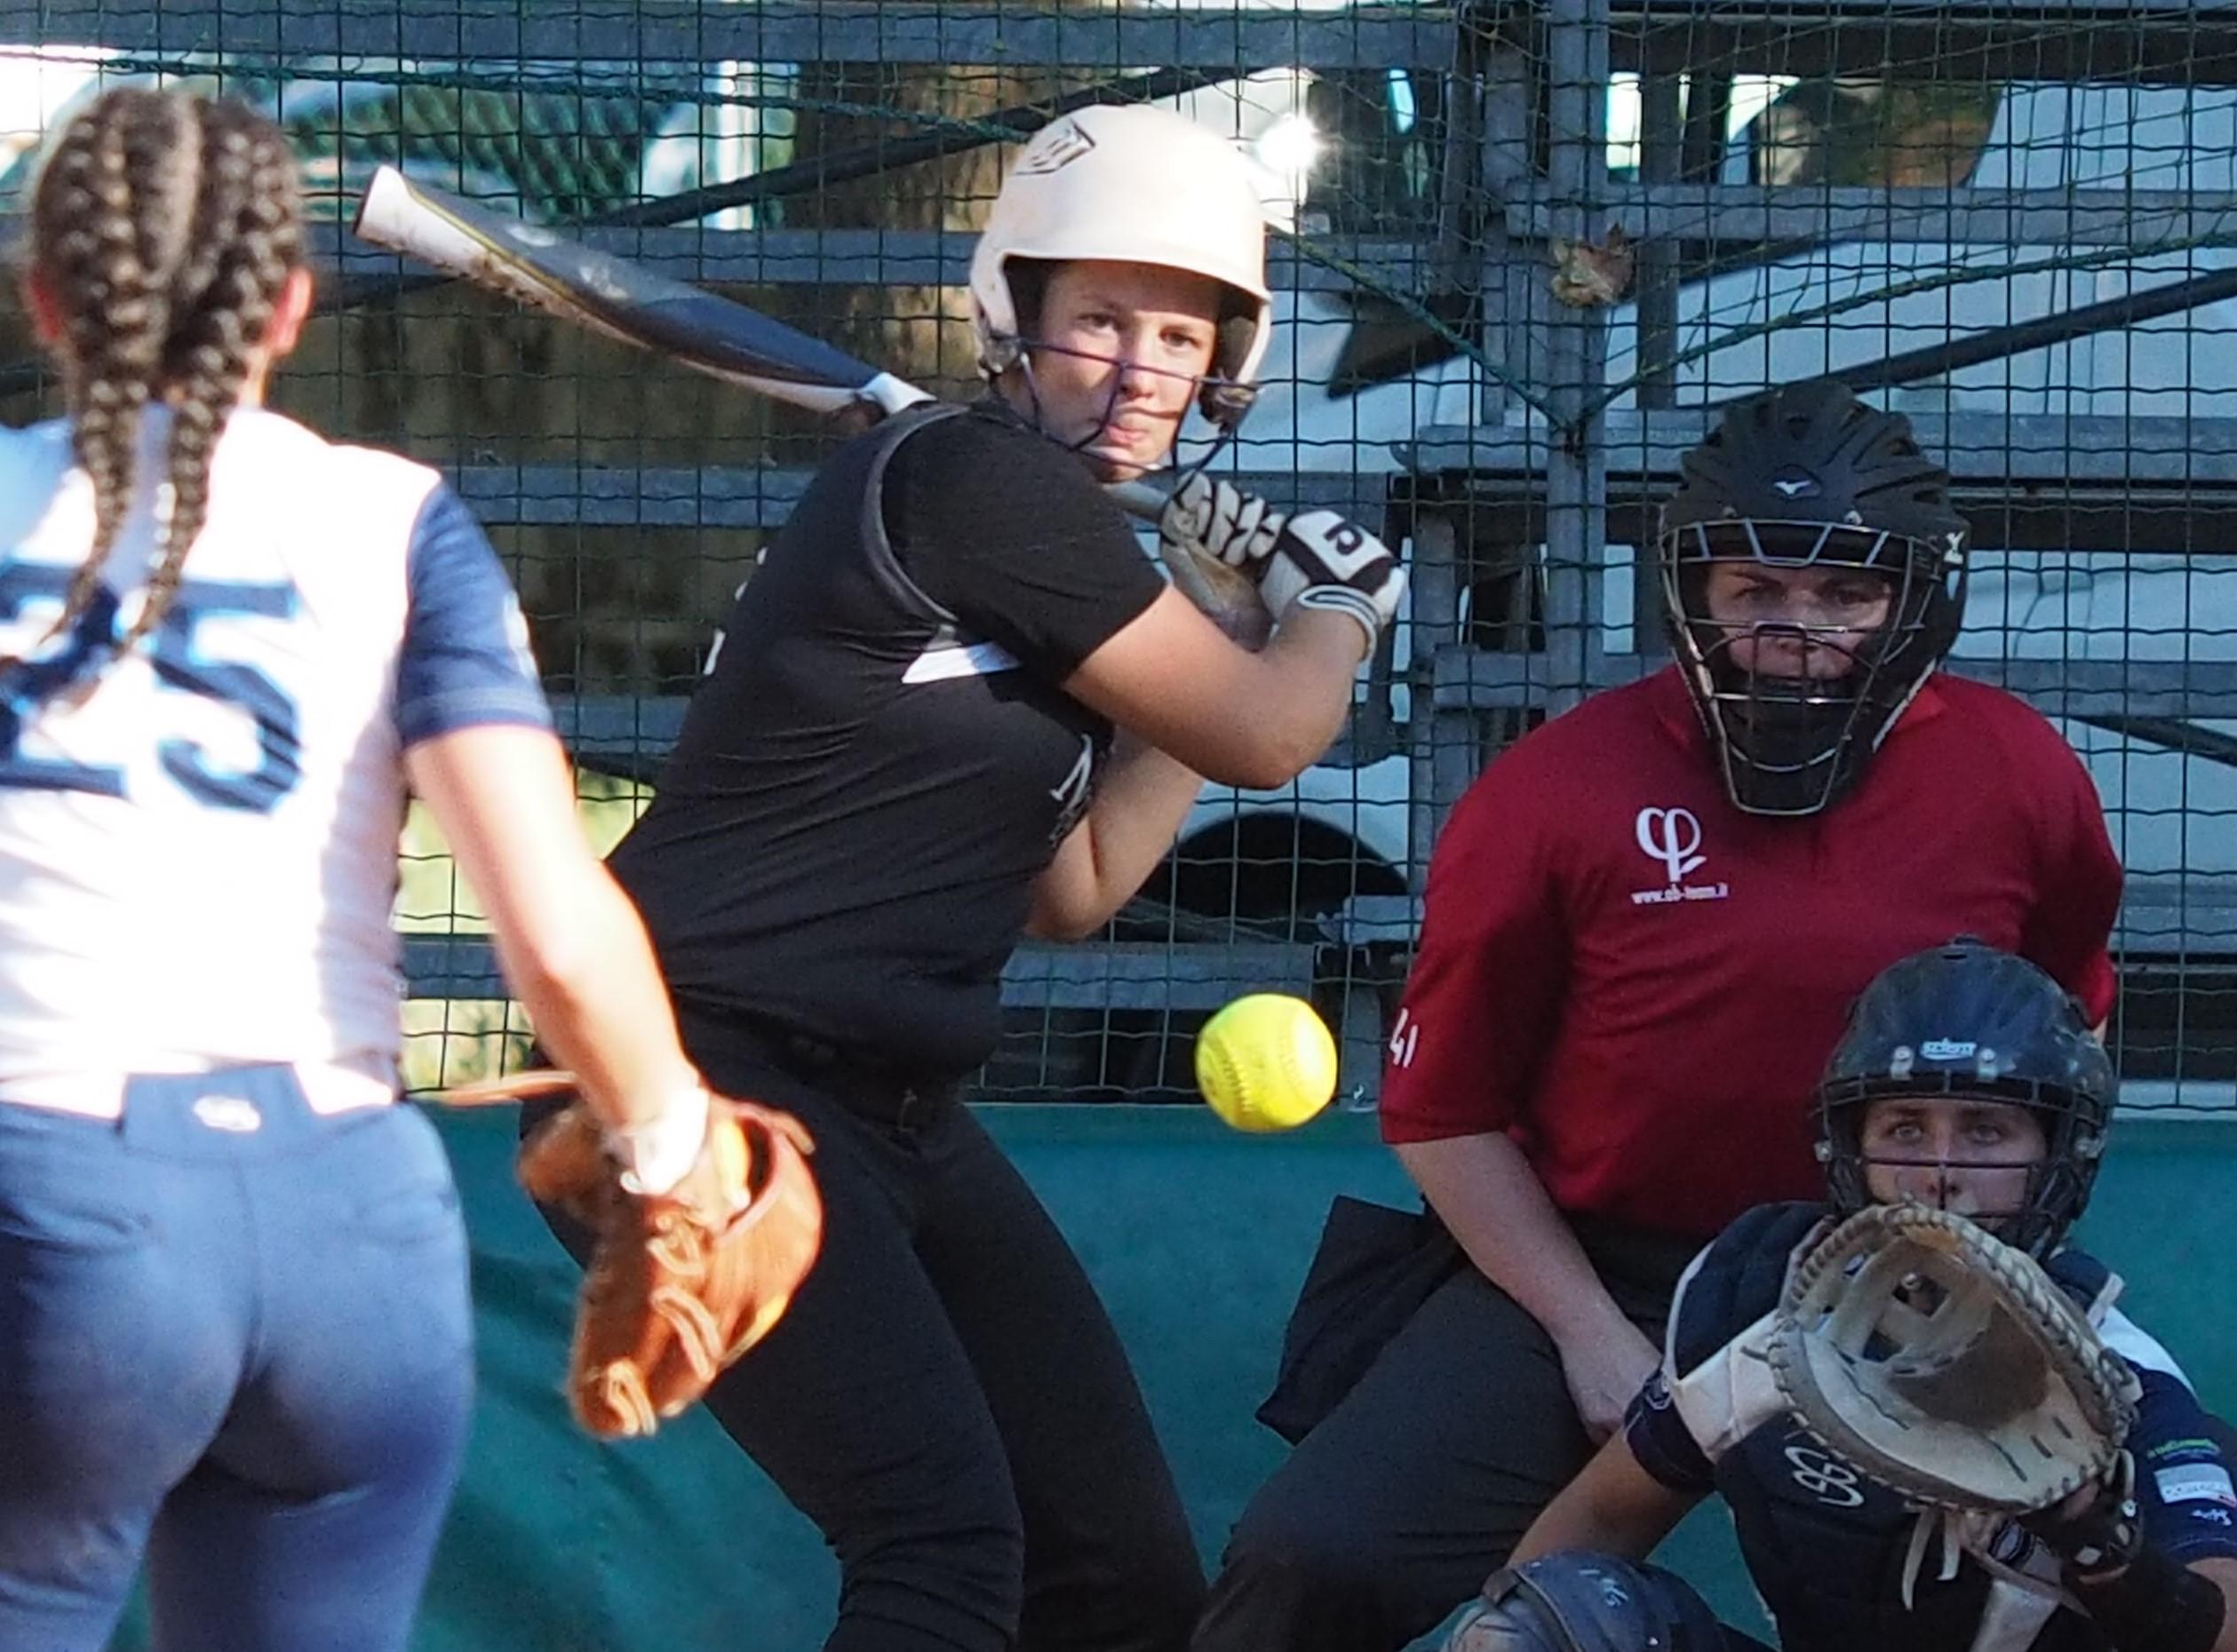 Virginia Mambelli Softball Poderi Dal Nespoli Forlì